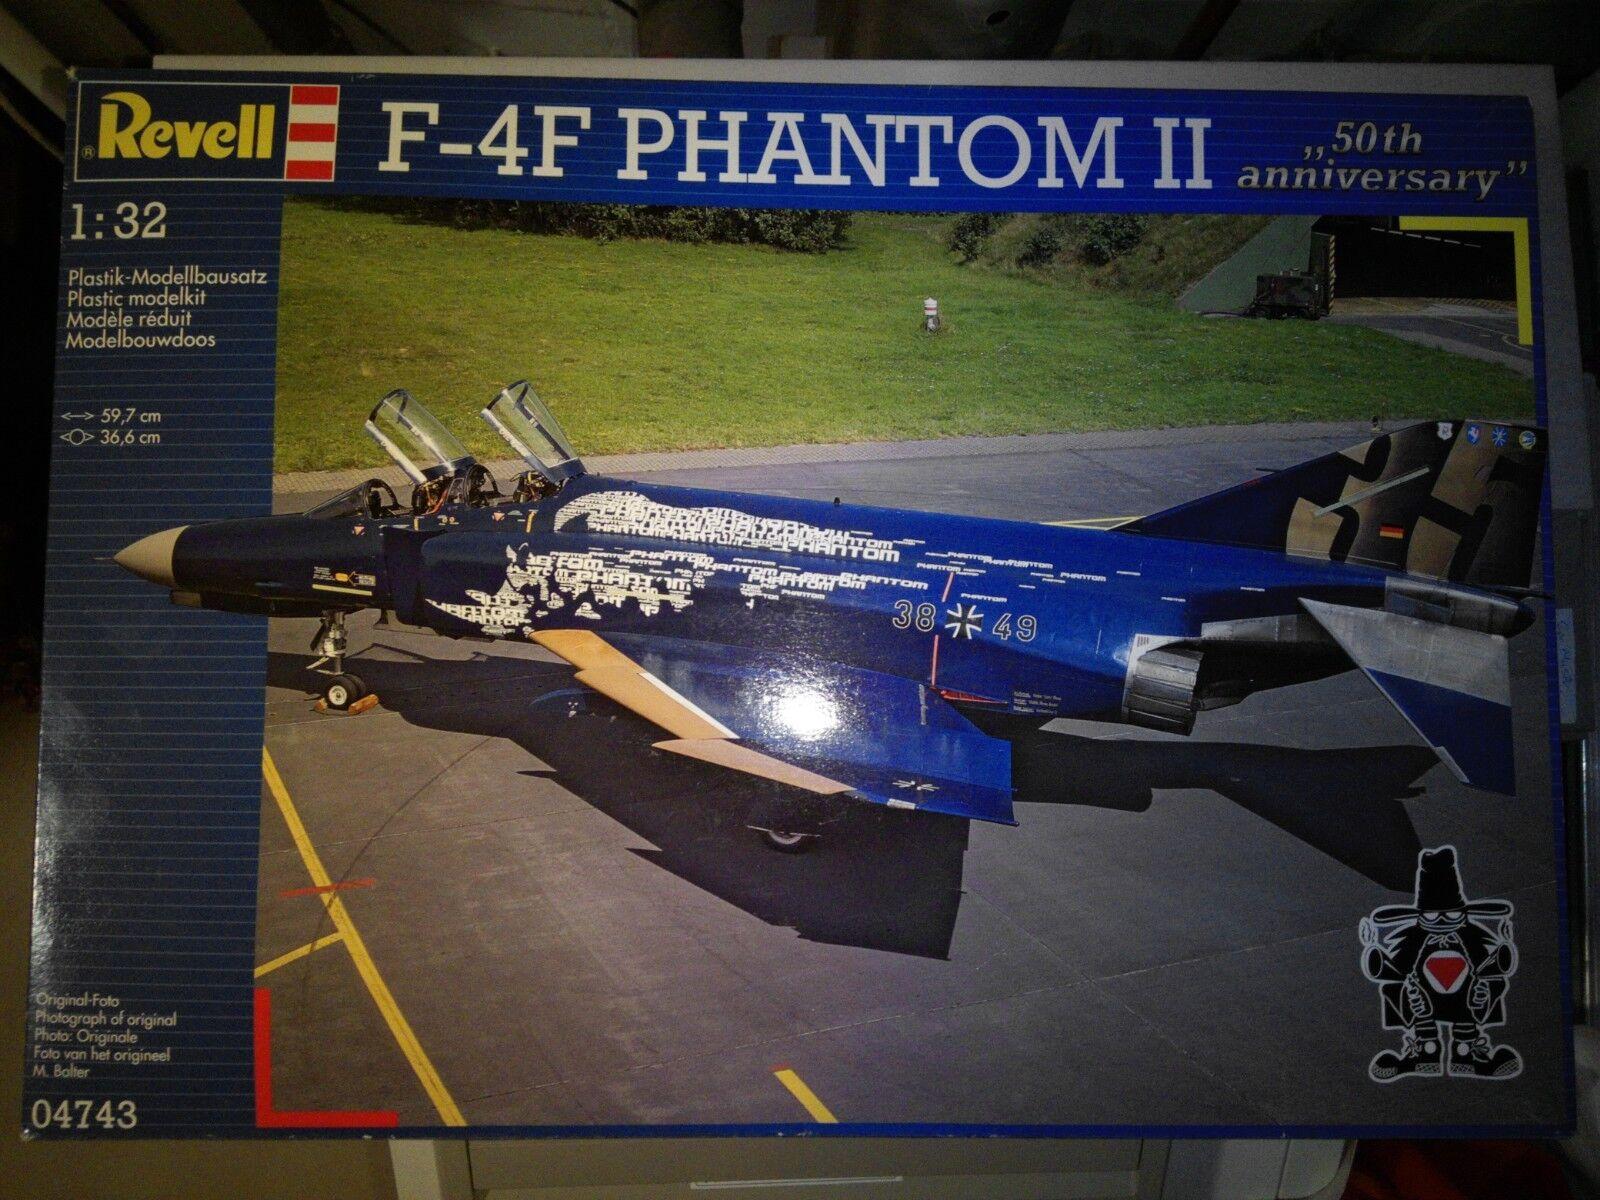 "McDonnell Douglas F-4F Phantom II  50 Jahre Phantom"" Phantom"" Phantom"" - Revell - 04743 - 1 32 d94dcd"